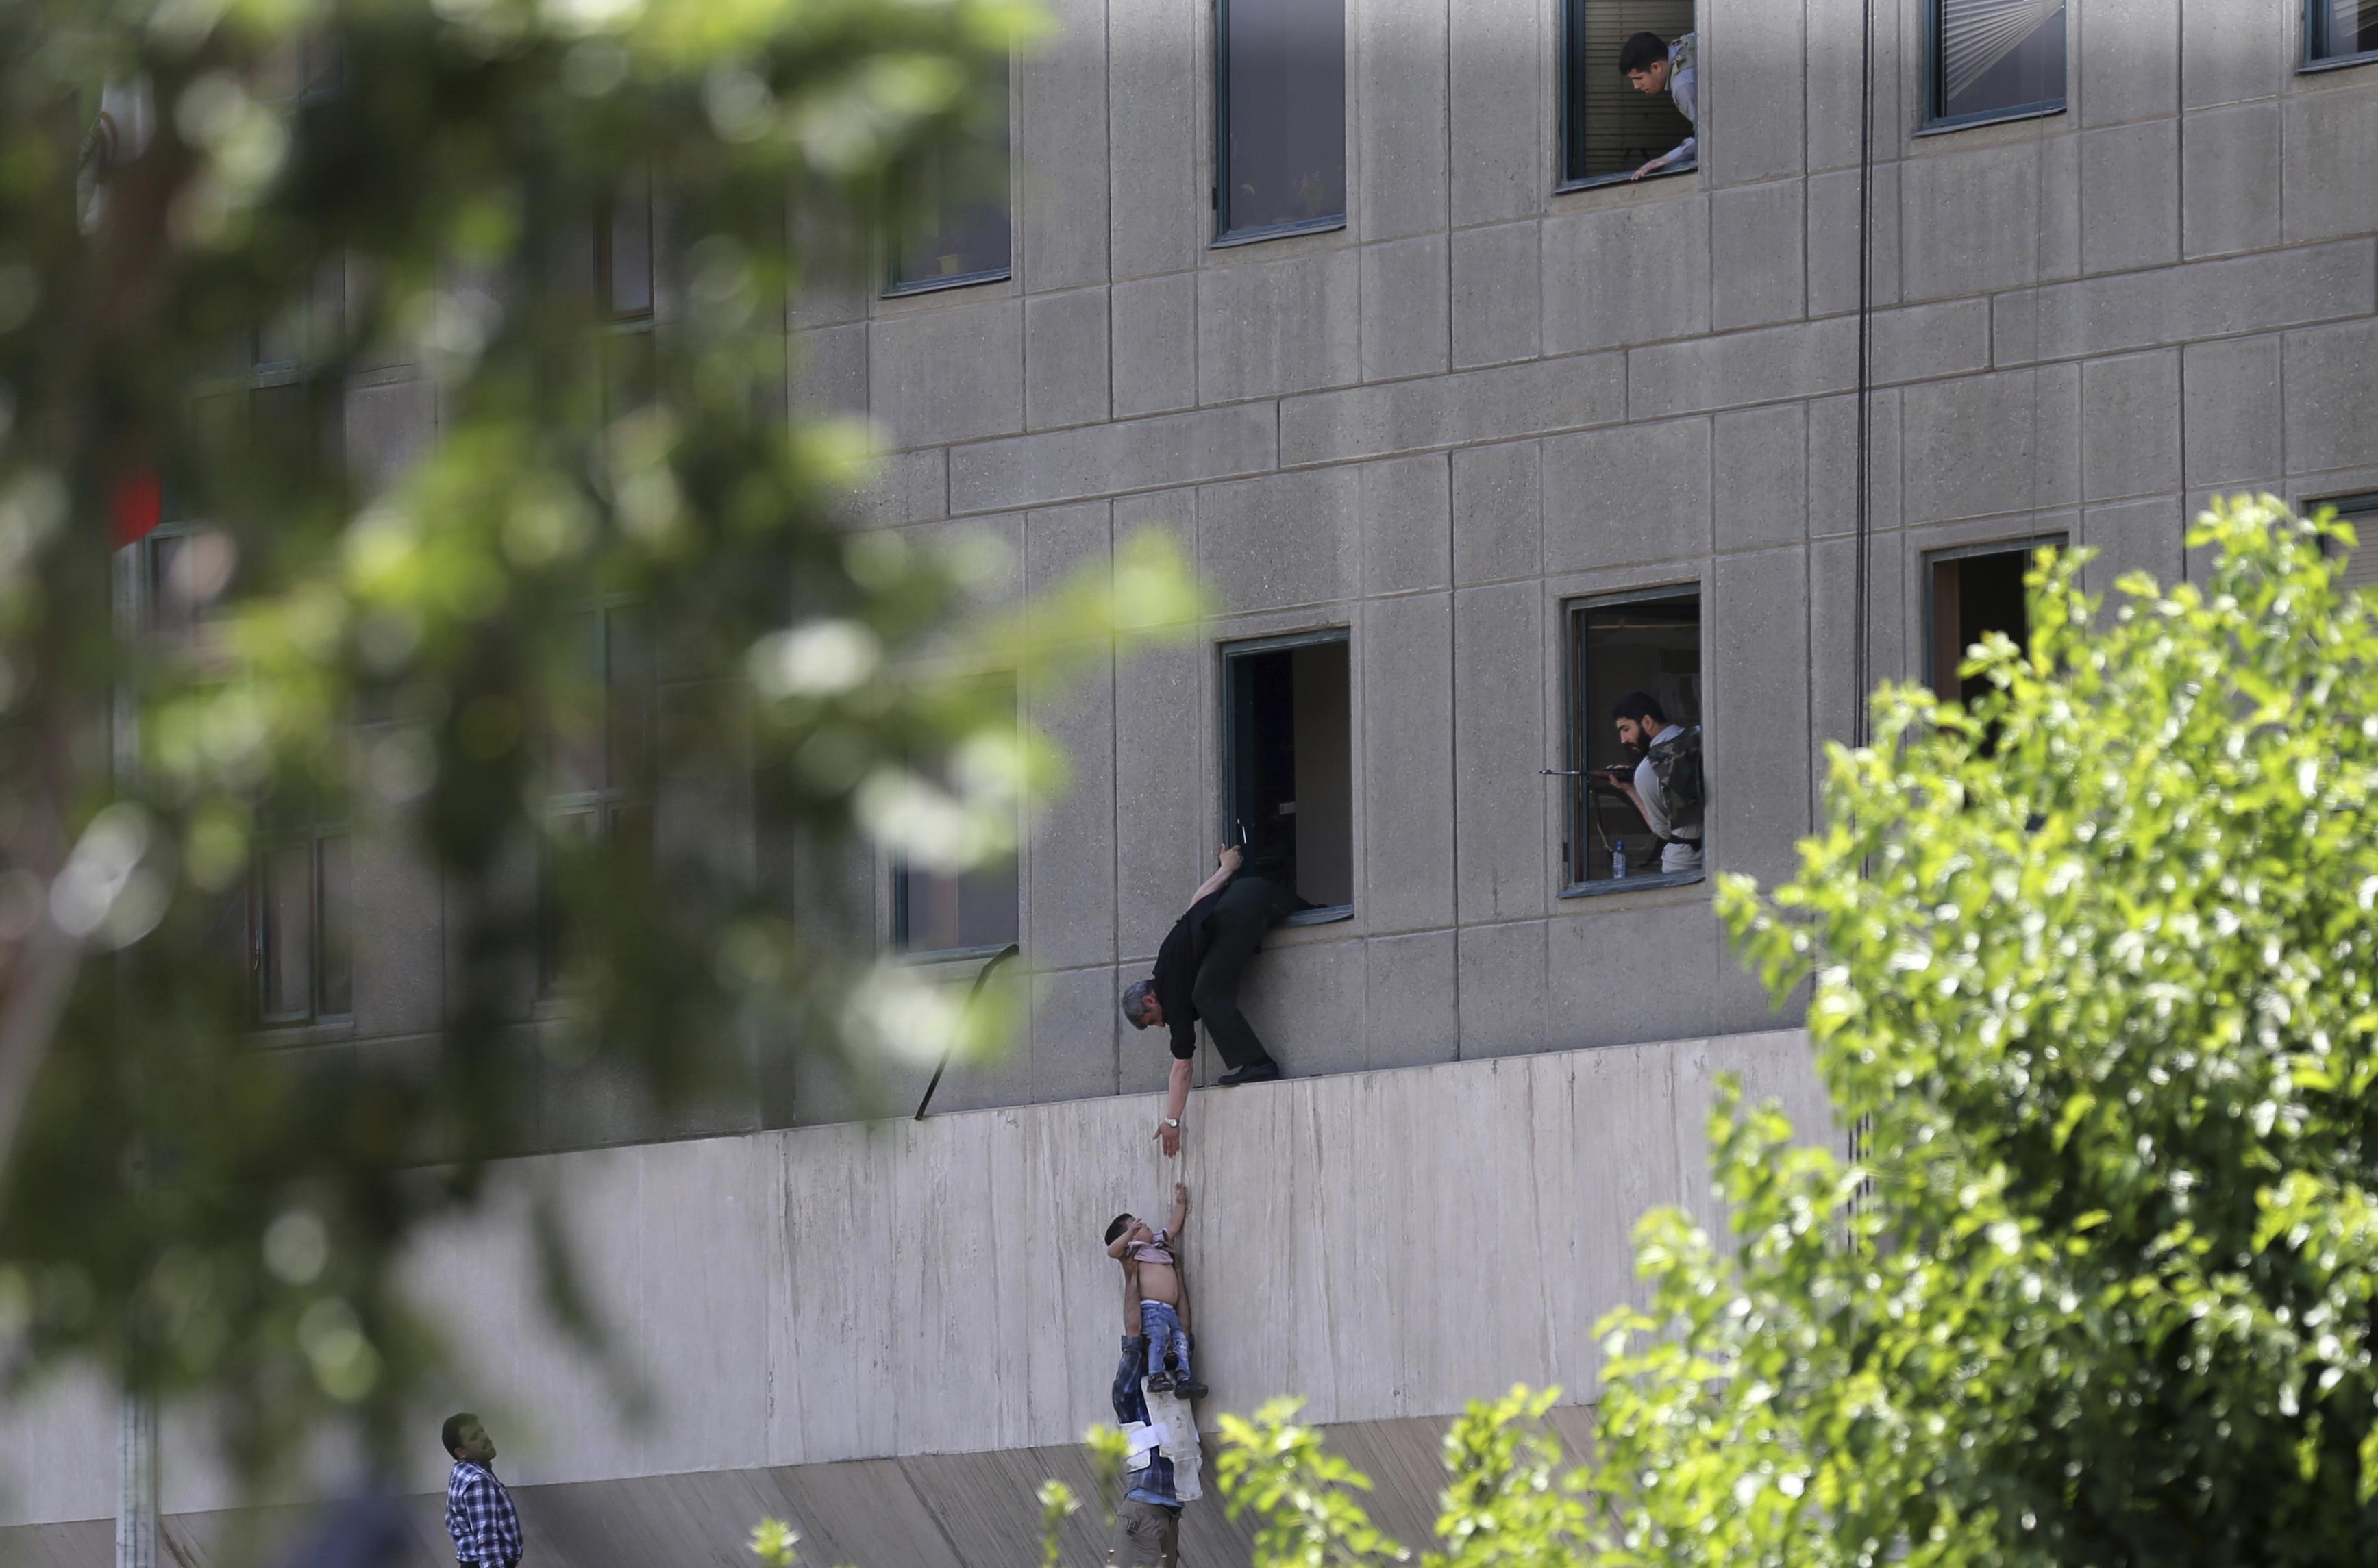 Iran's parliament, Khomeini Shrine attacked